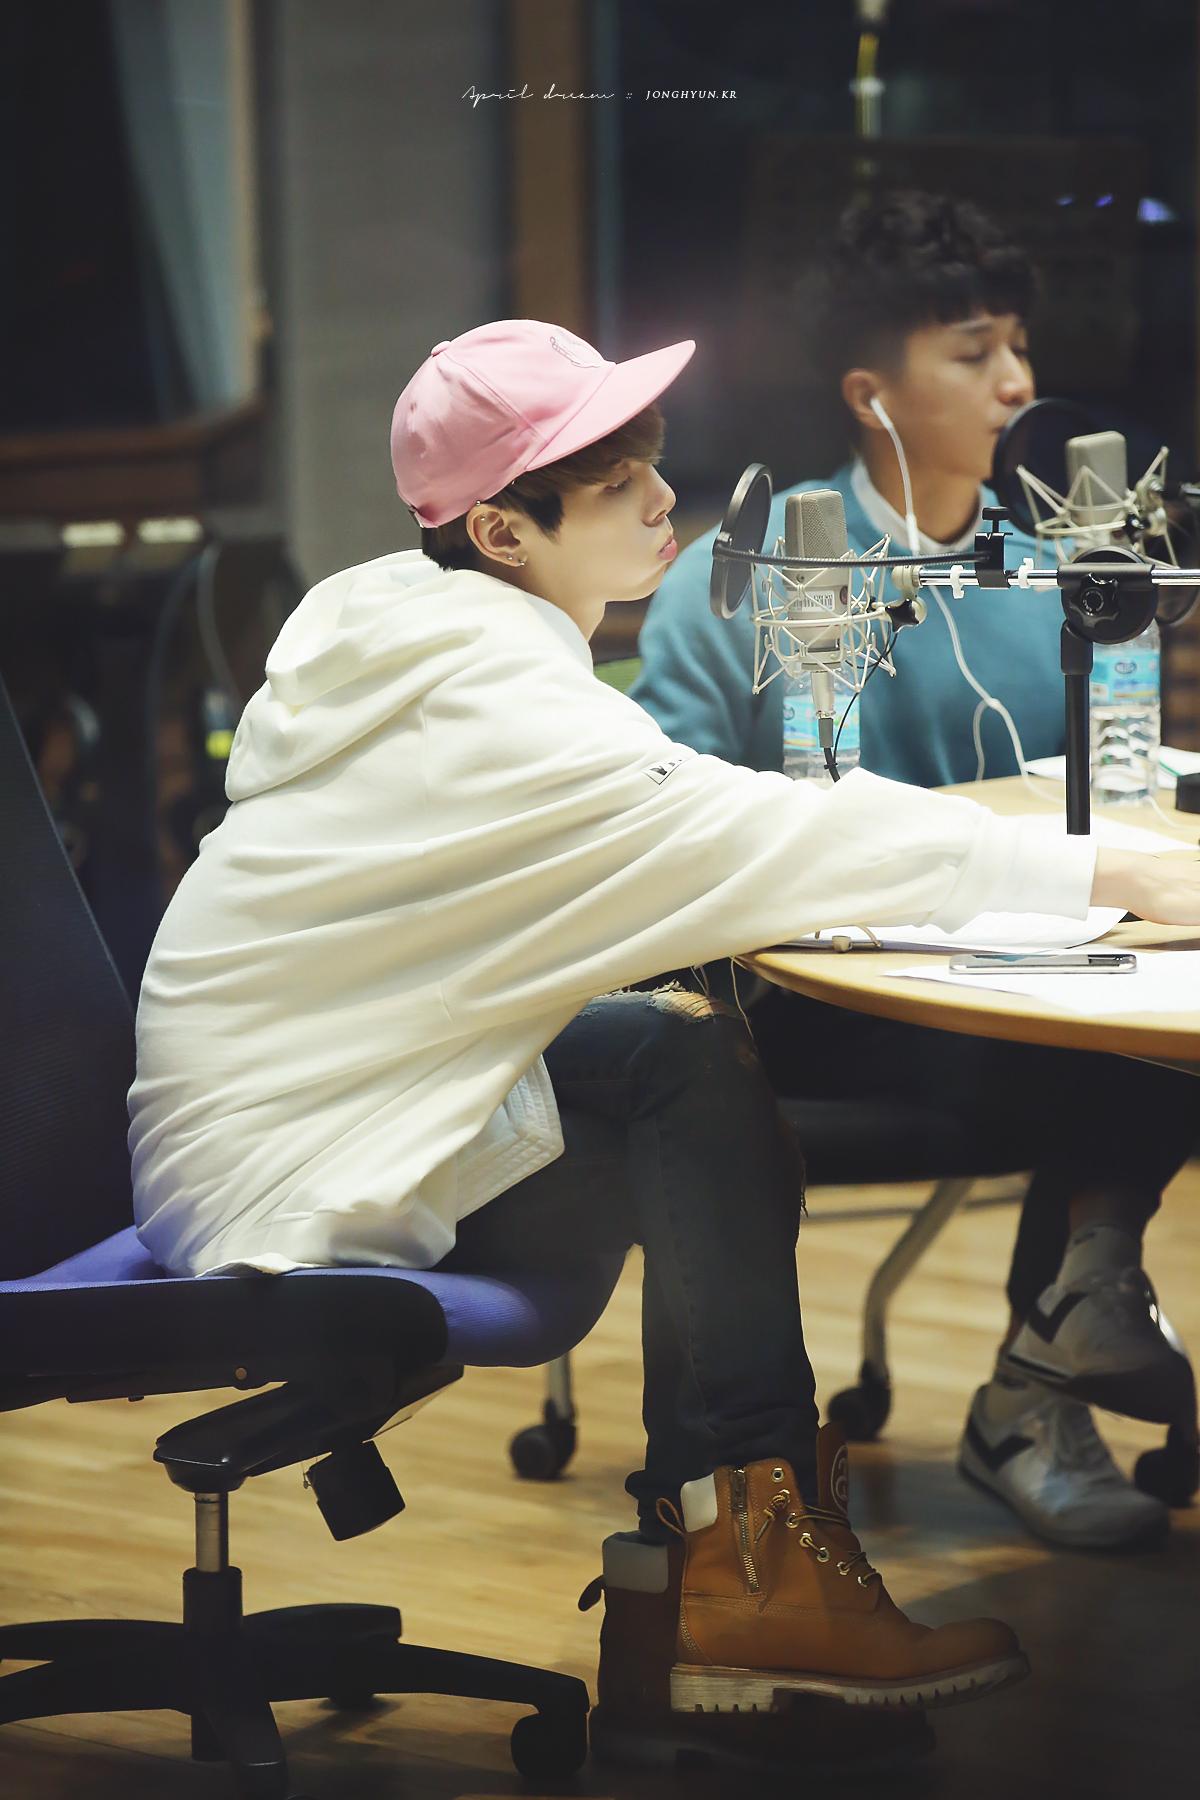 160415 Jonghyun @ MBC Blue Night 26382725451_49e6b27f5c_o